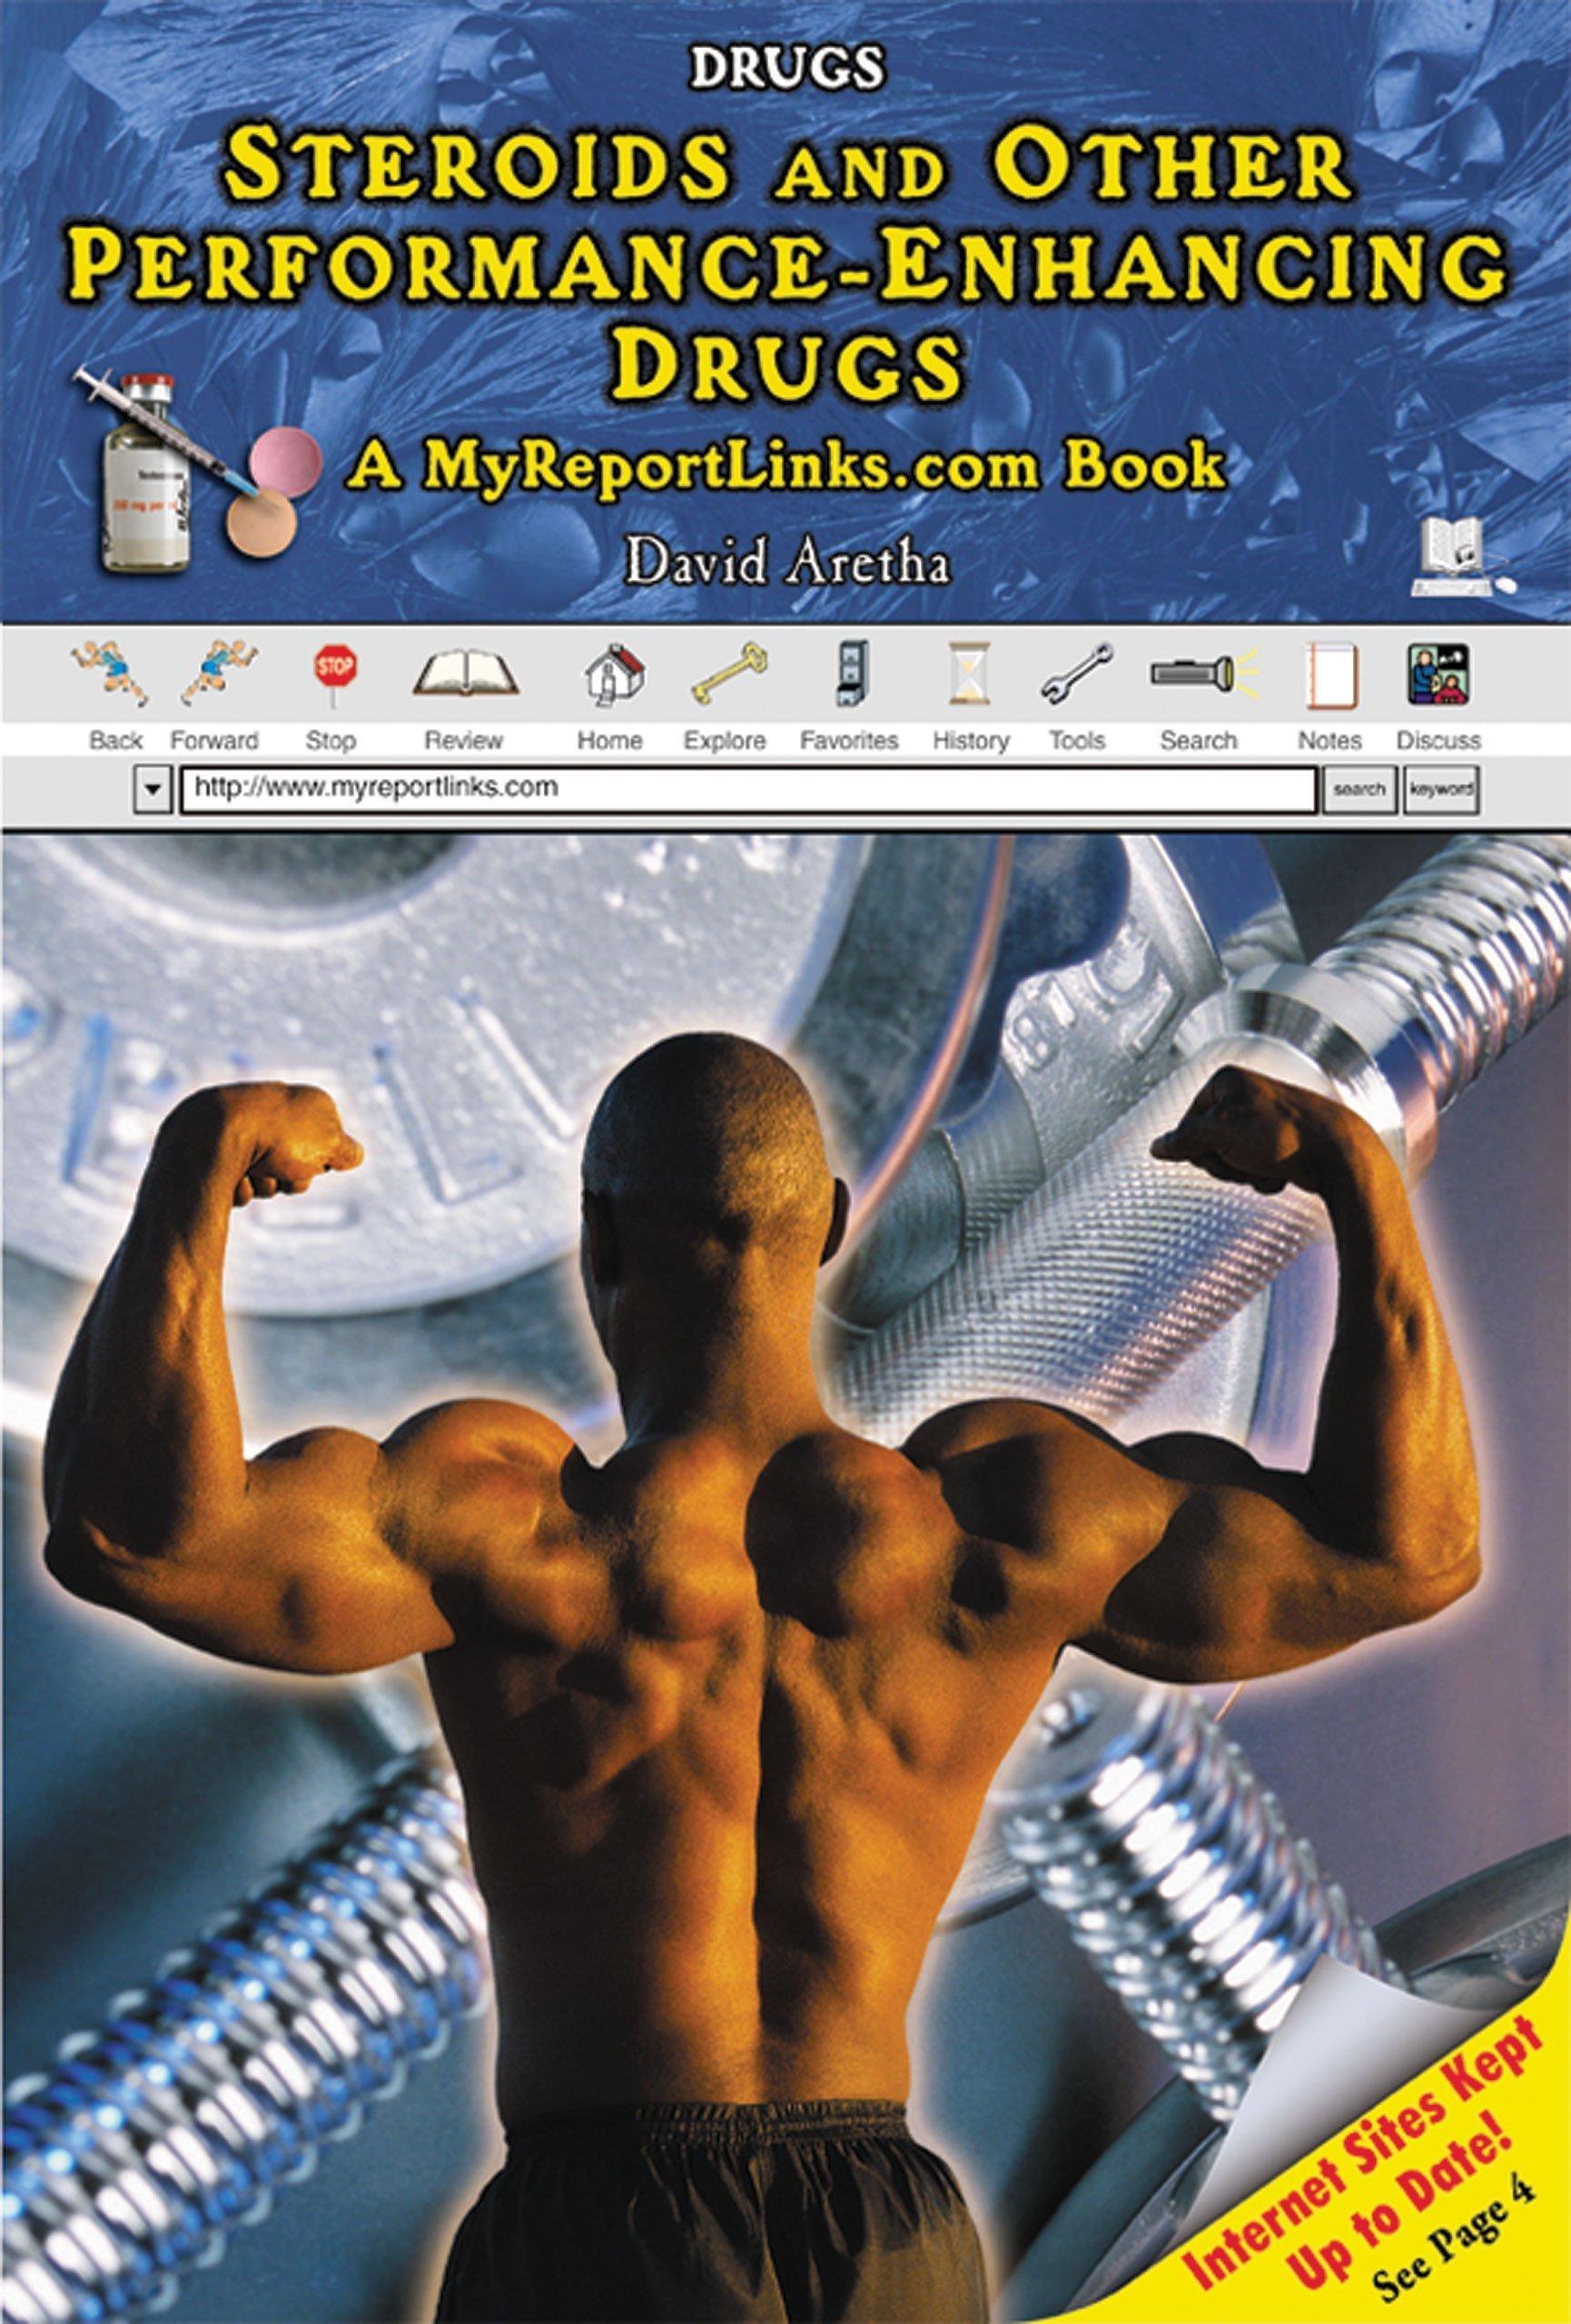 Search steroids where did steroids originate from